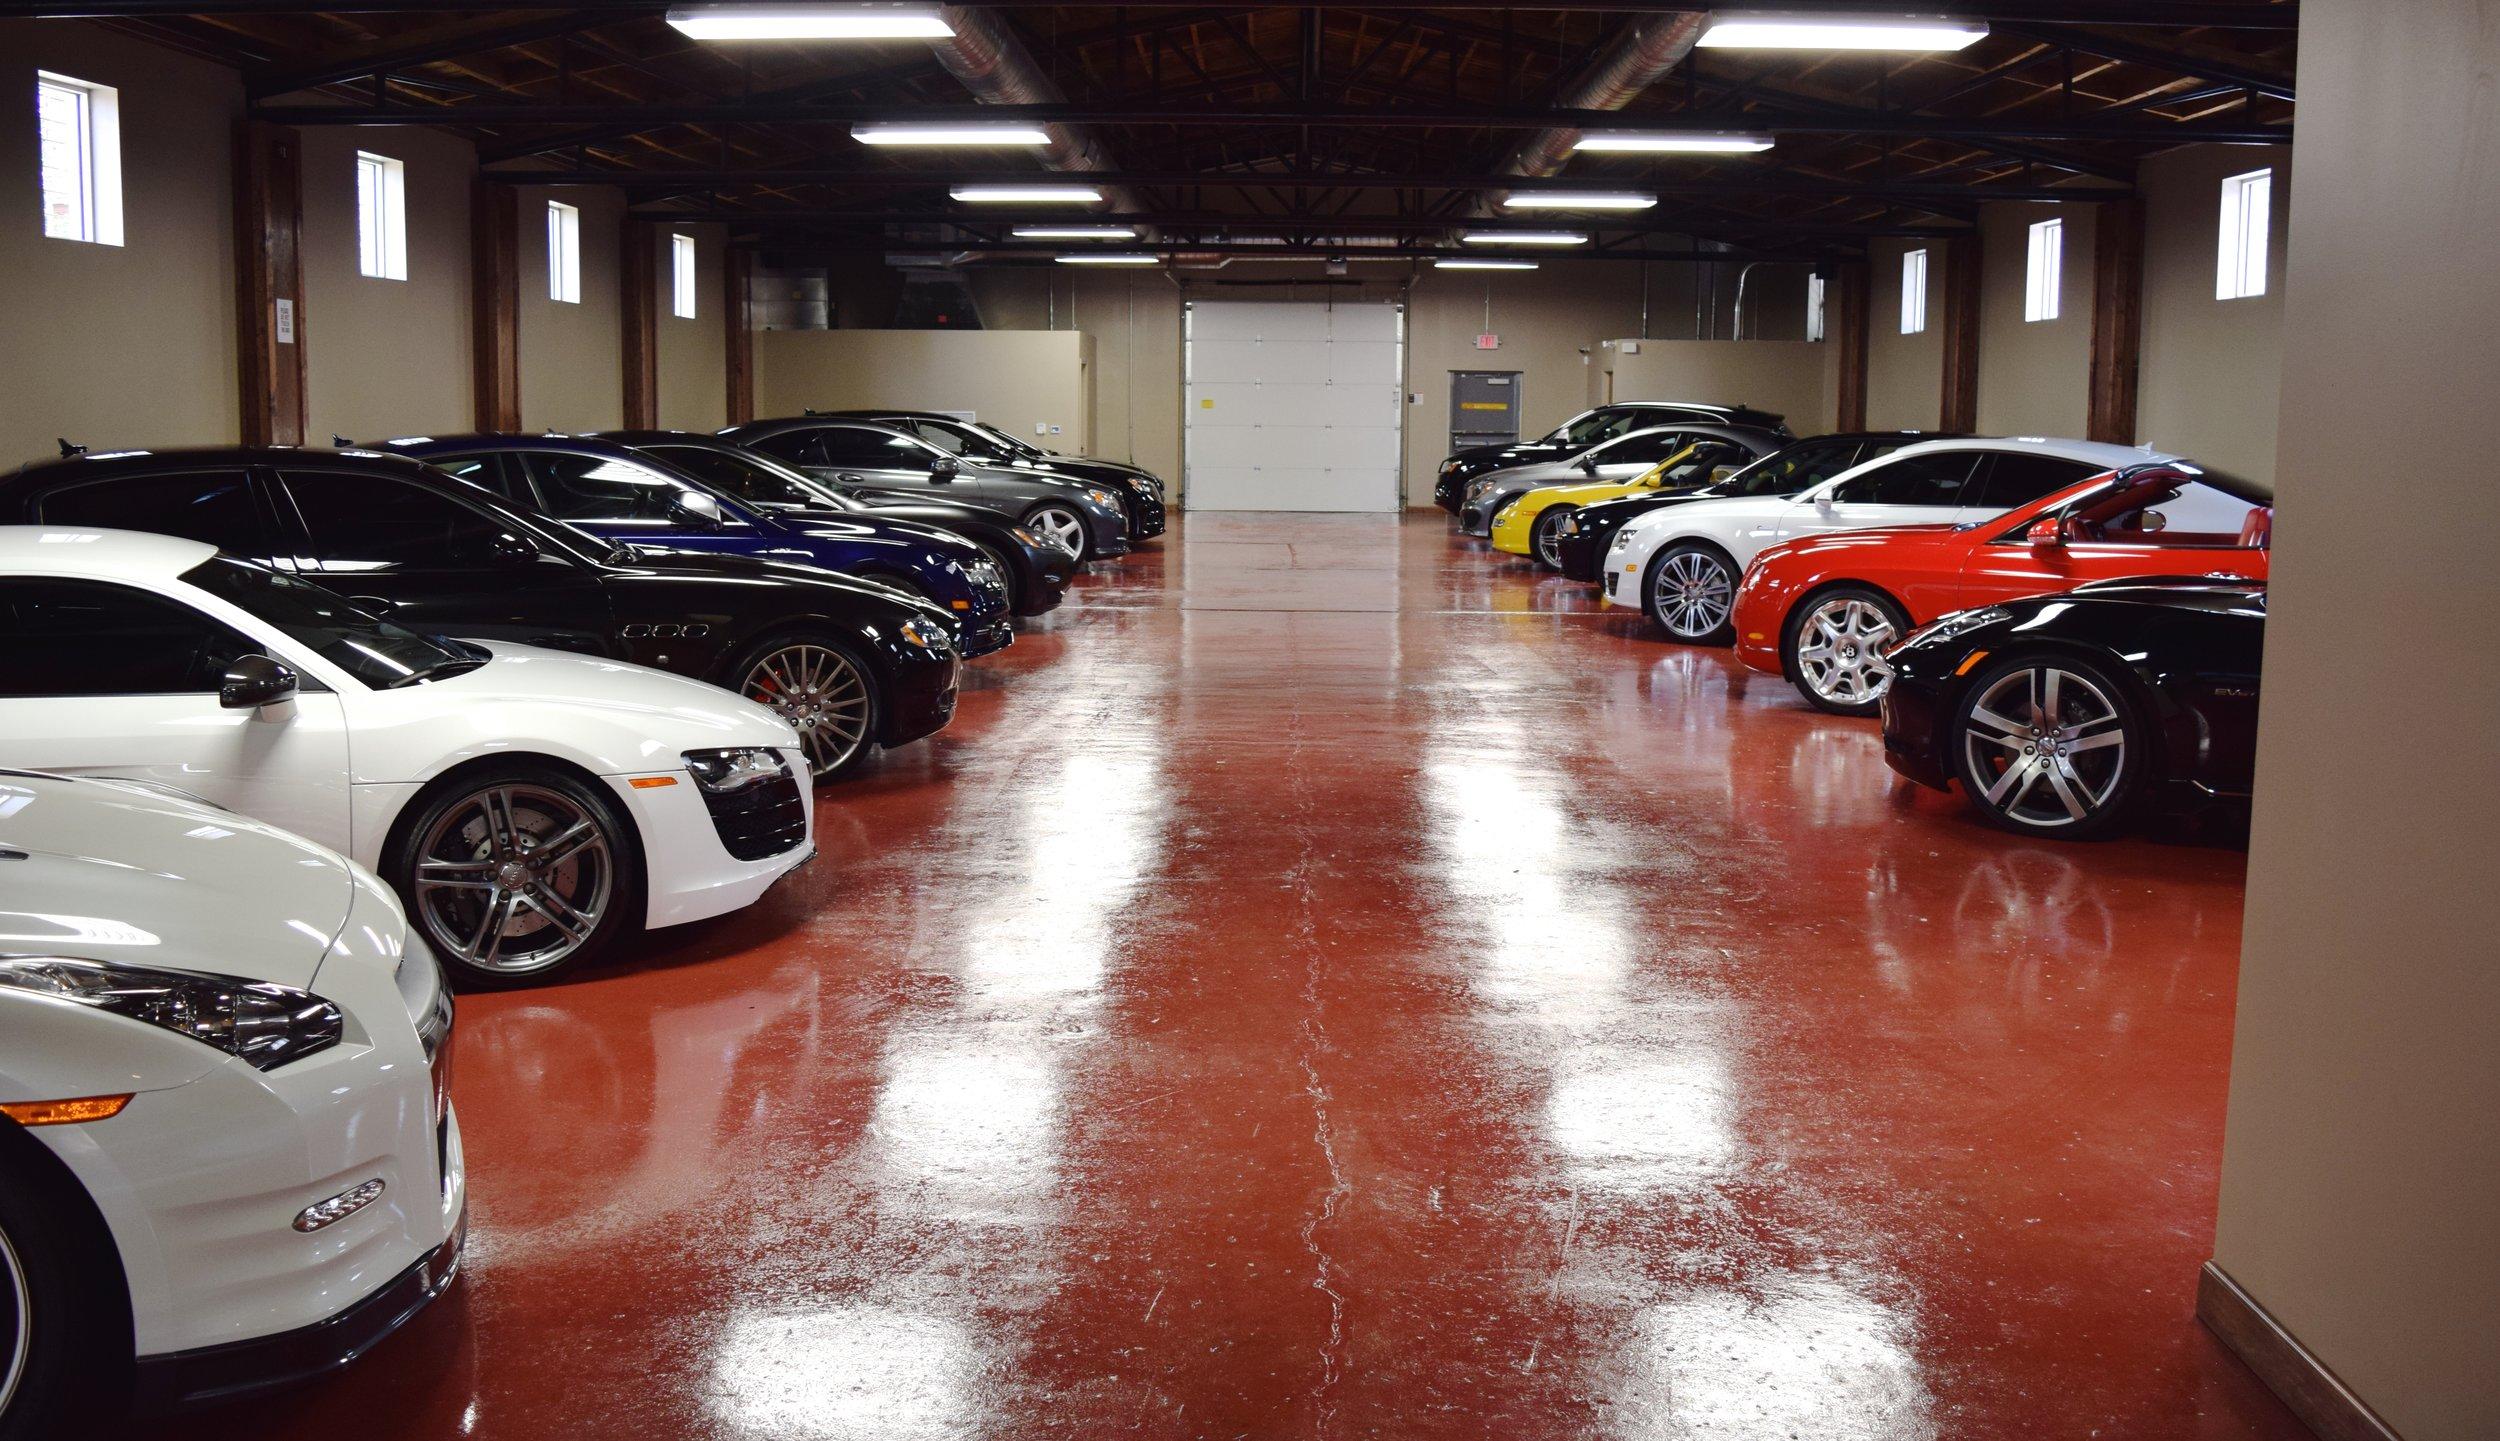 Metrolina Auto Storage Exotic Luxury Car Storage - Luxury car show